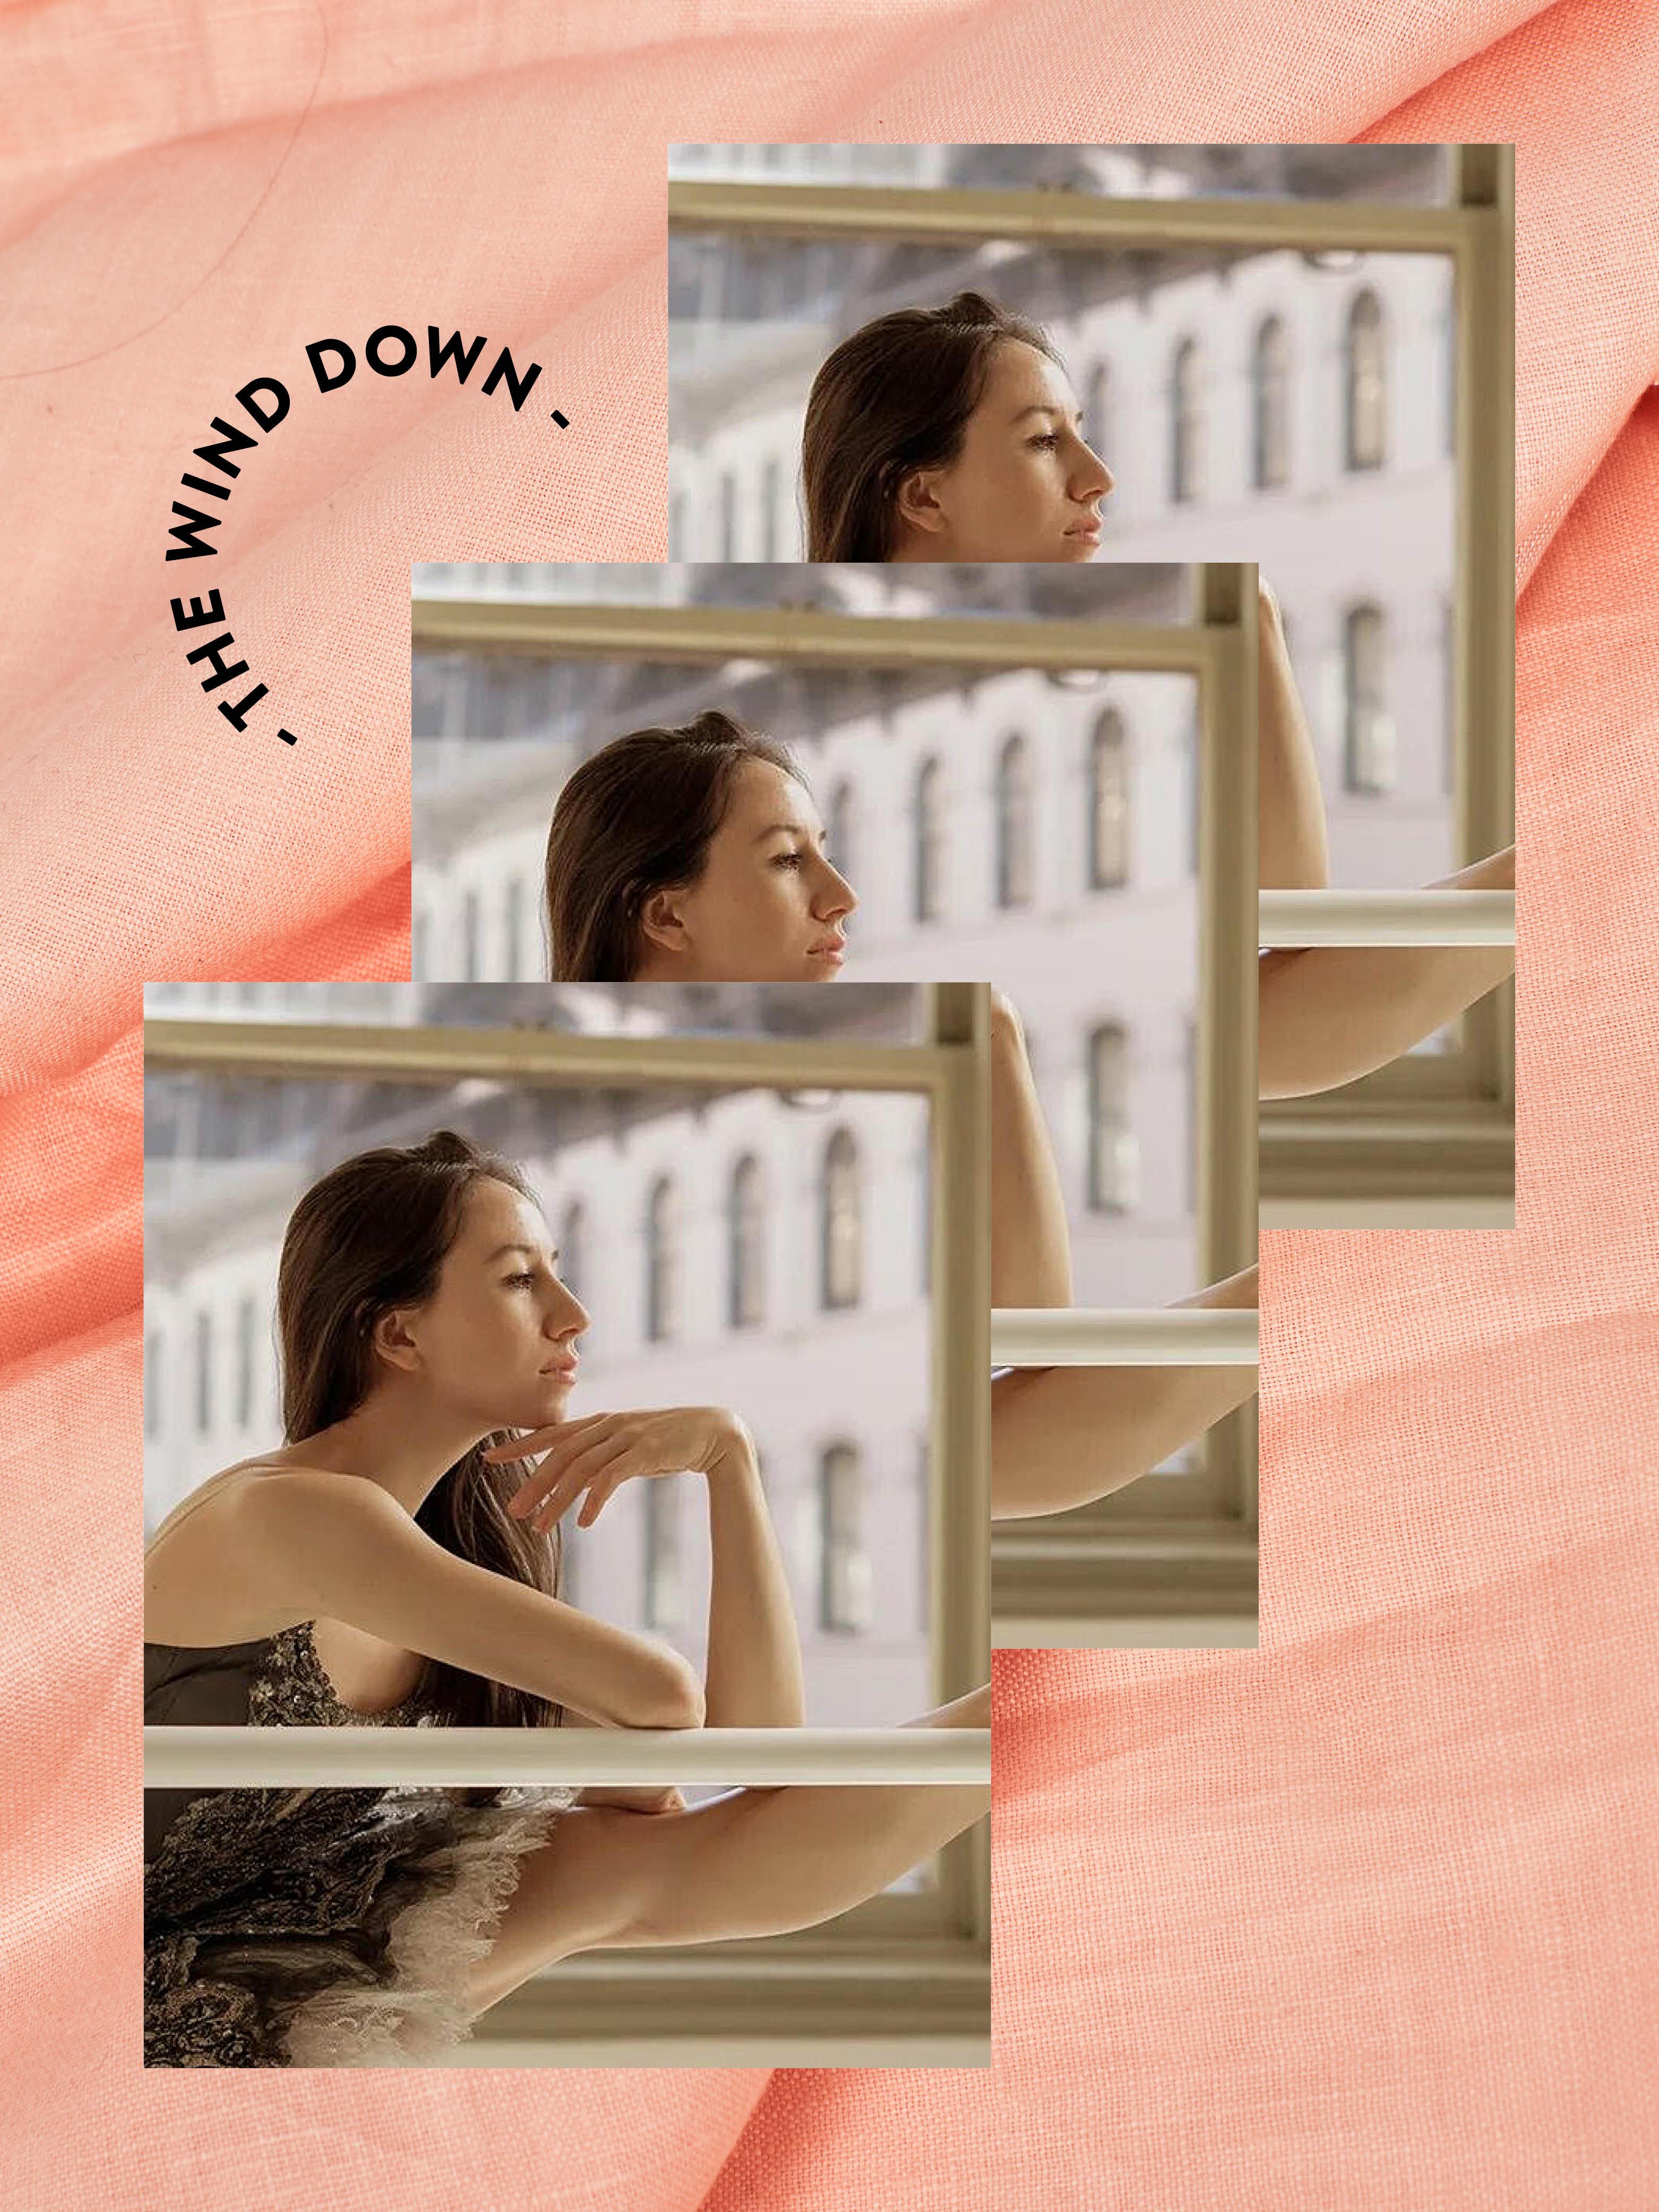 isabella-boylston-wind-down-domino